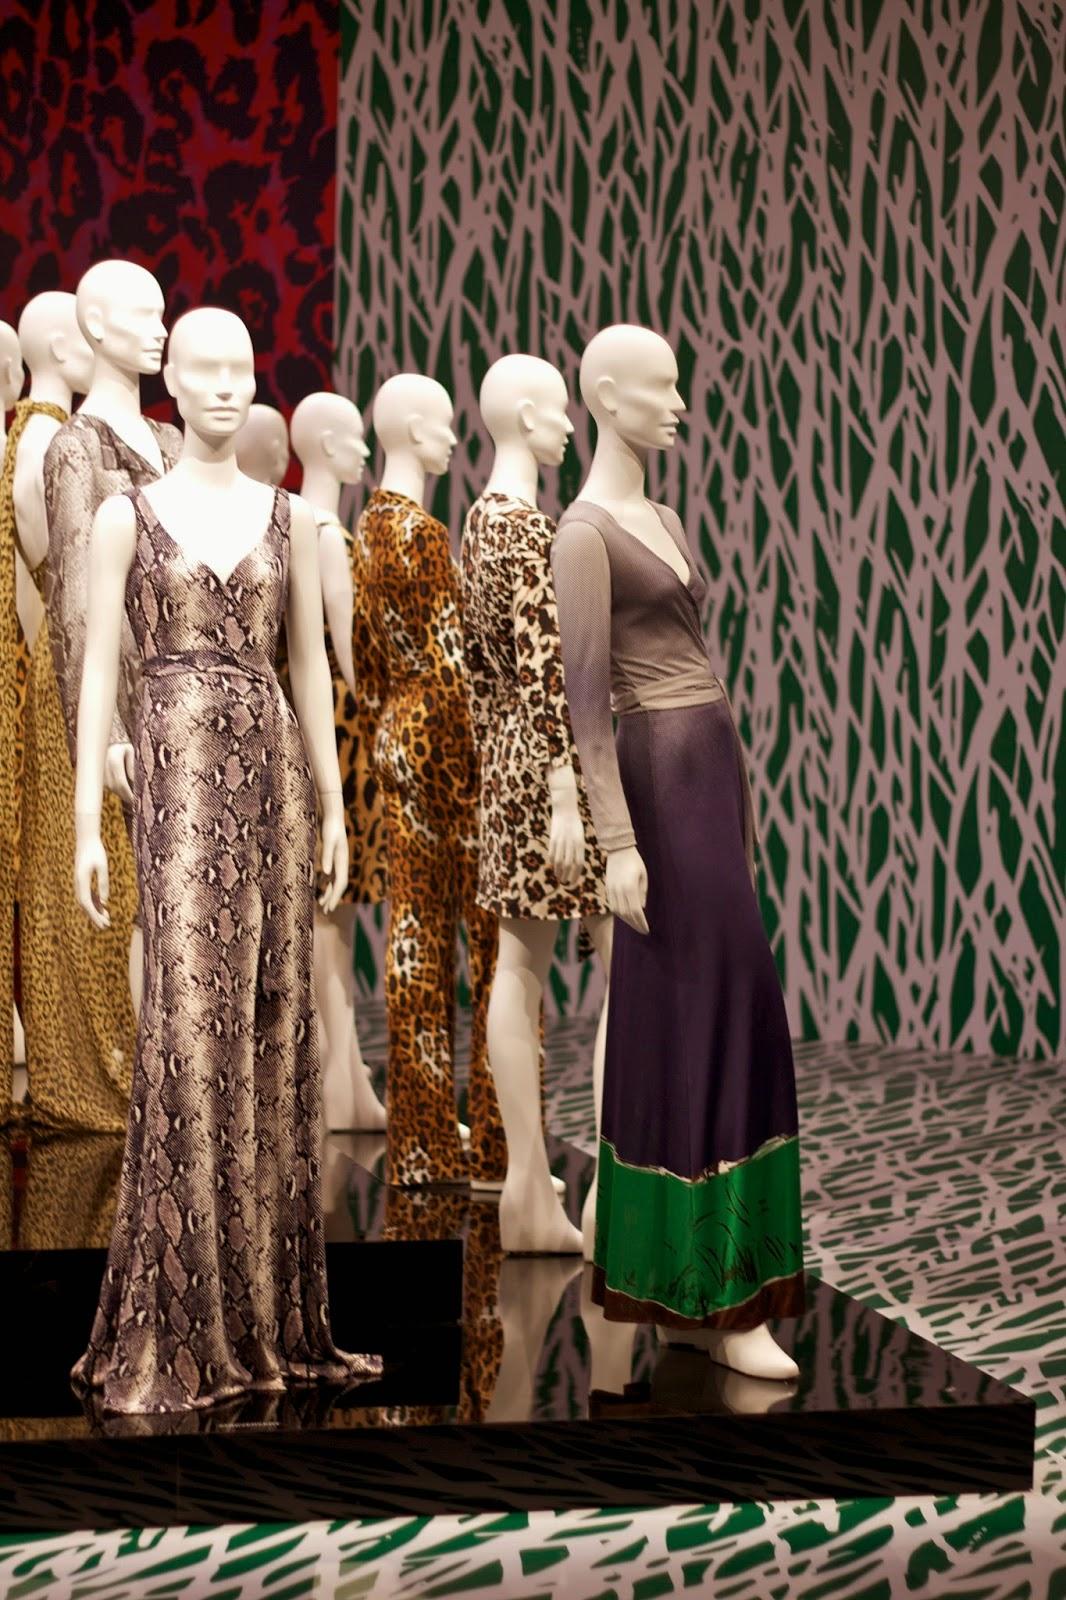 lacma dvf exhibit, lacma dvf exhibit mannequins